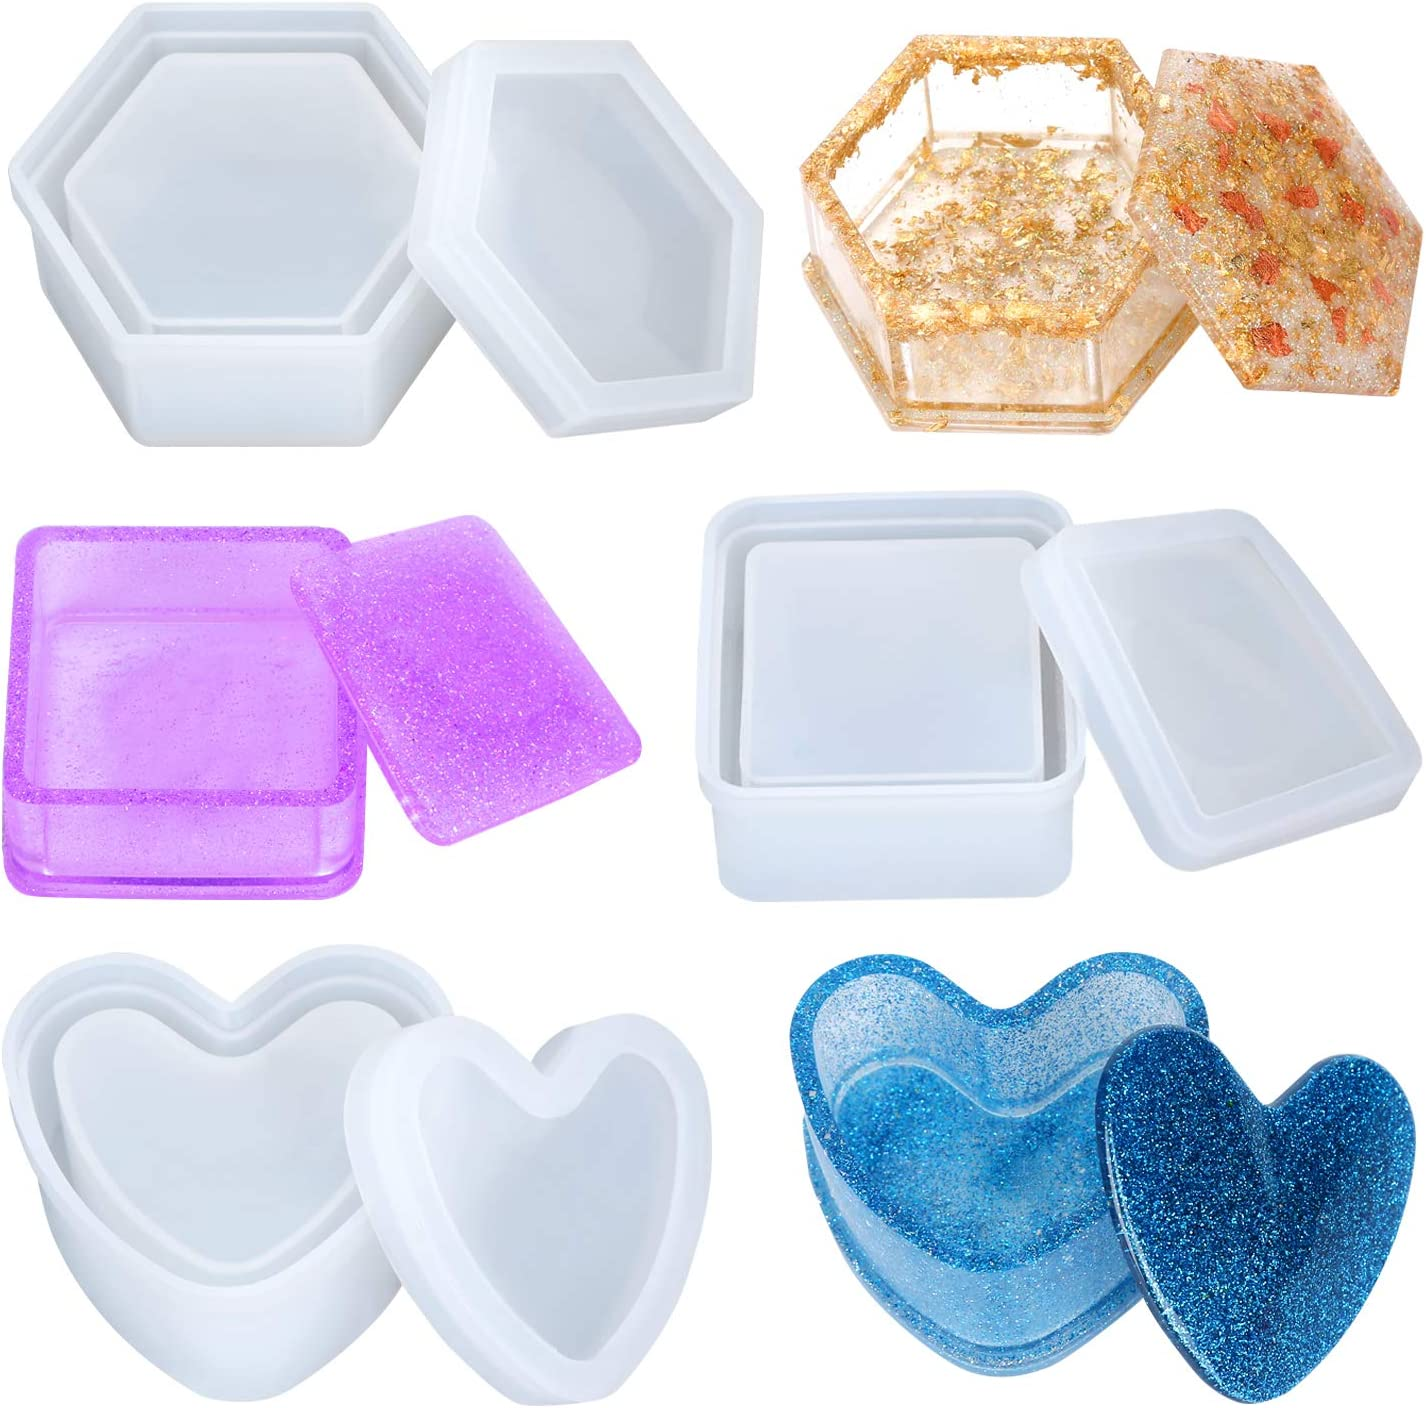 Keys Coins 1PCS Rings Box Resin Molds,DIY Flower Box Resin Mold for Making Gift Boxes Jewelry Box Molds for Storing Earrings